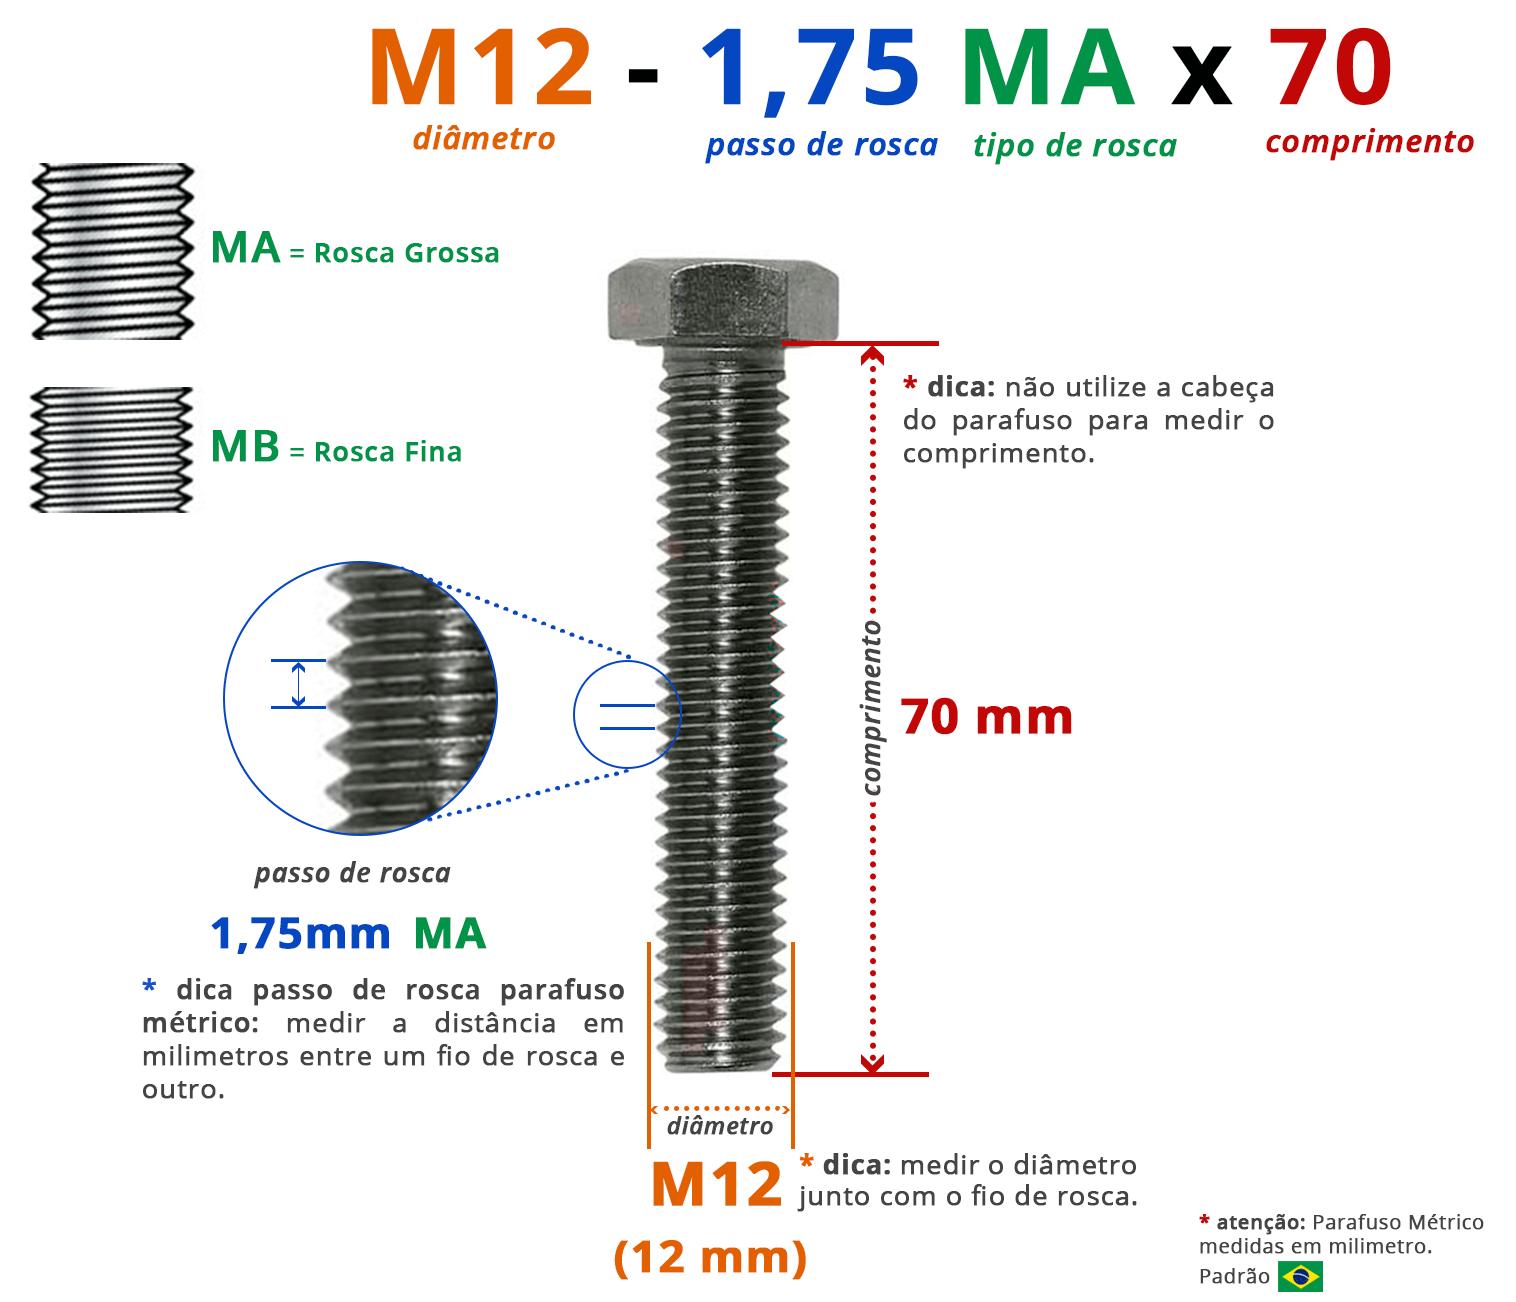 PARAFUSO SEXTAVADO ROSCA INTEIRA M12 1,75 MA X 70 DIN 933 INOX A4